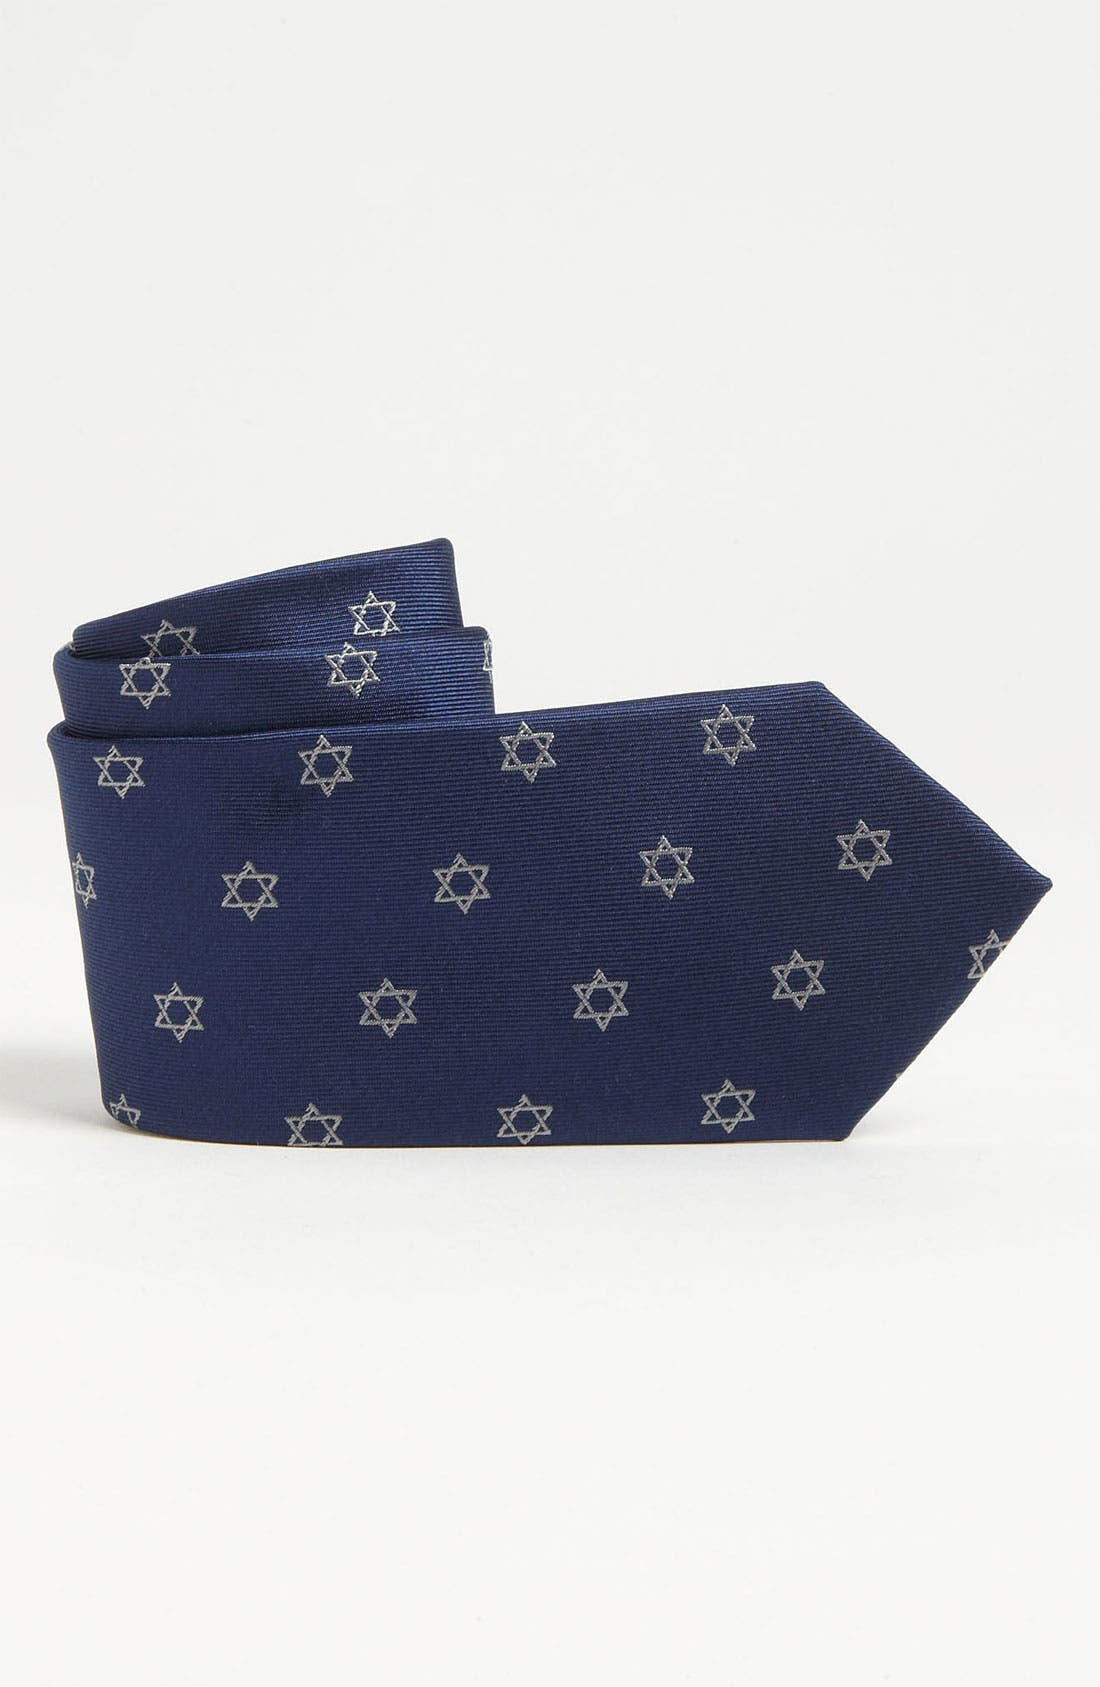 Alternate Image 1 Selected - Nordstrom Woven Silk Tie (Little Boys)